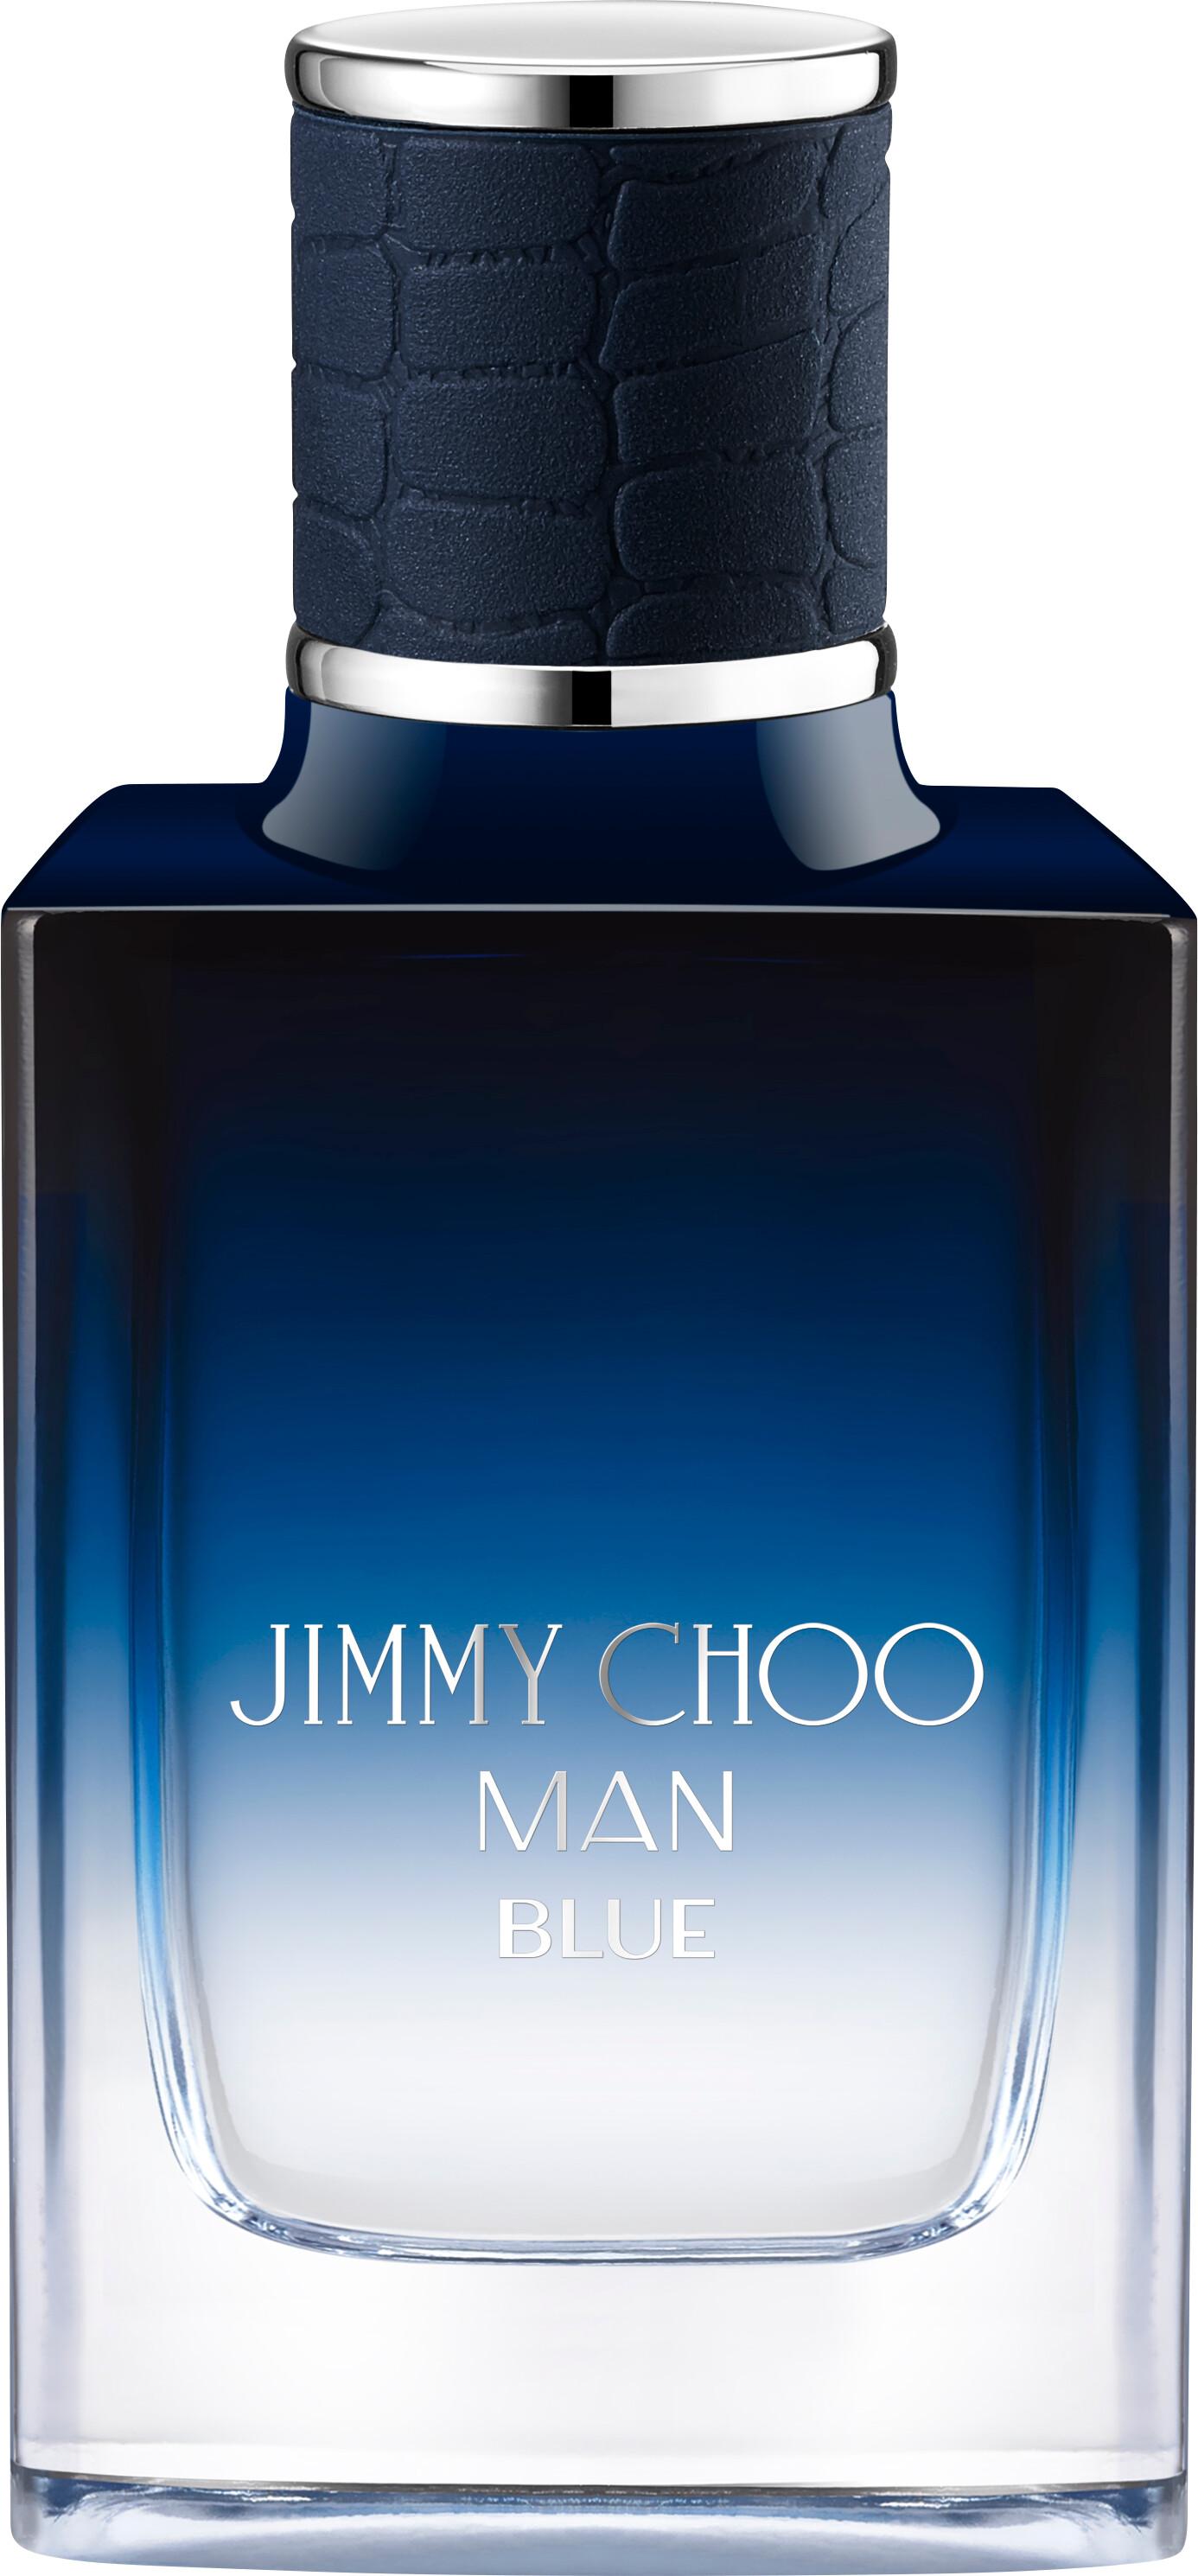 0819545d0db ... Jimmy Choo Man Blue Eau de Toilette Spray 30ml ...